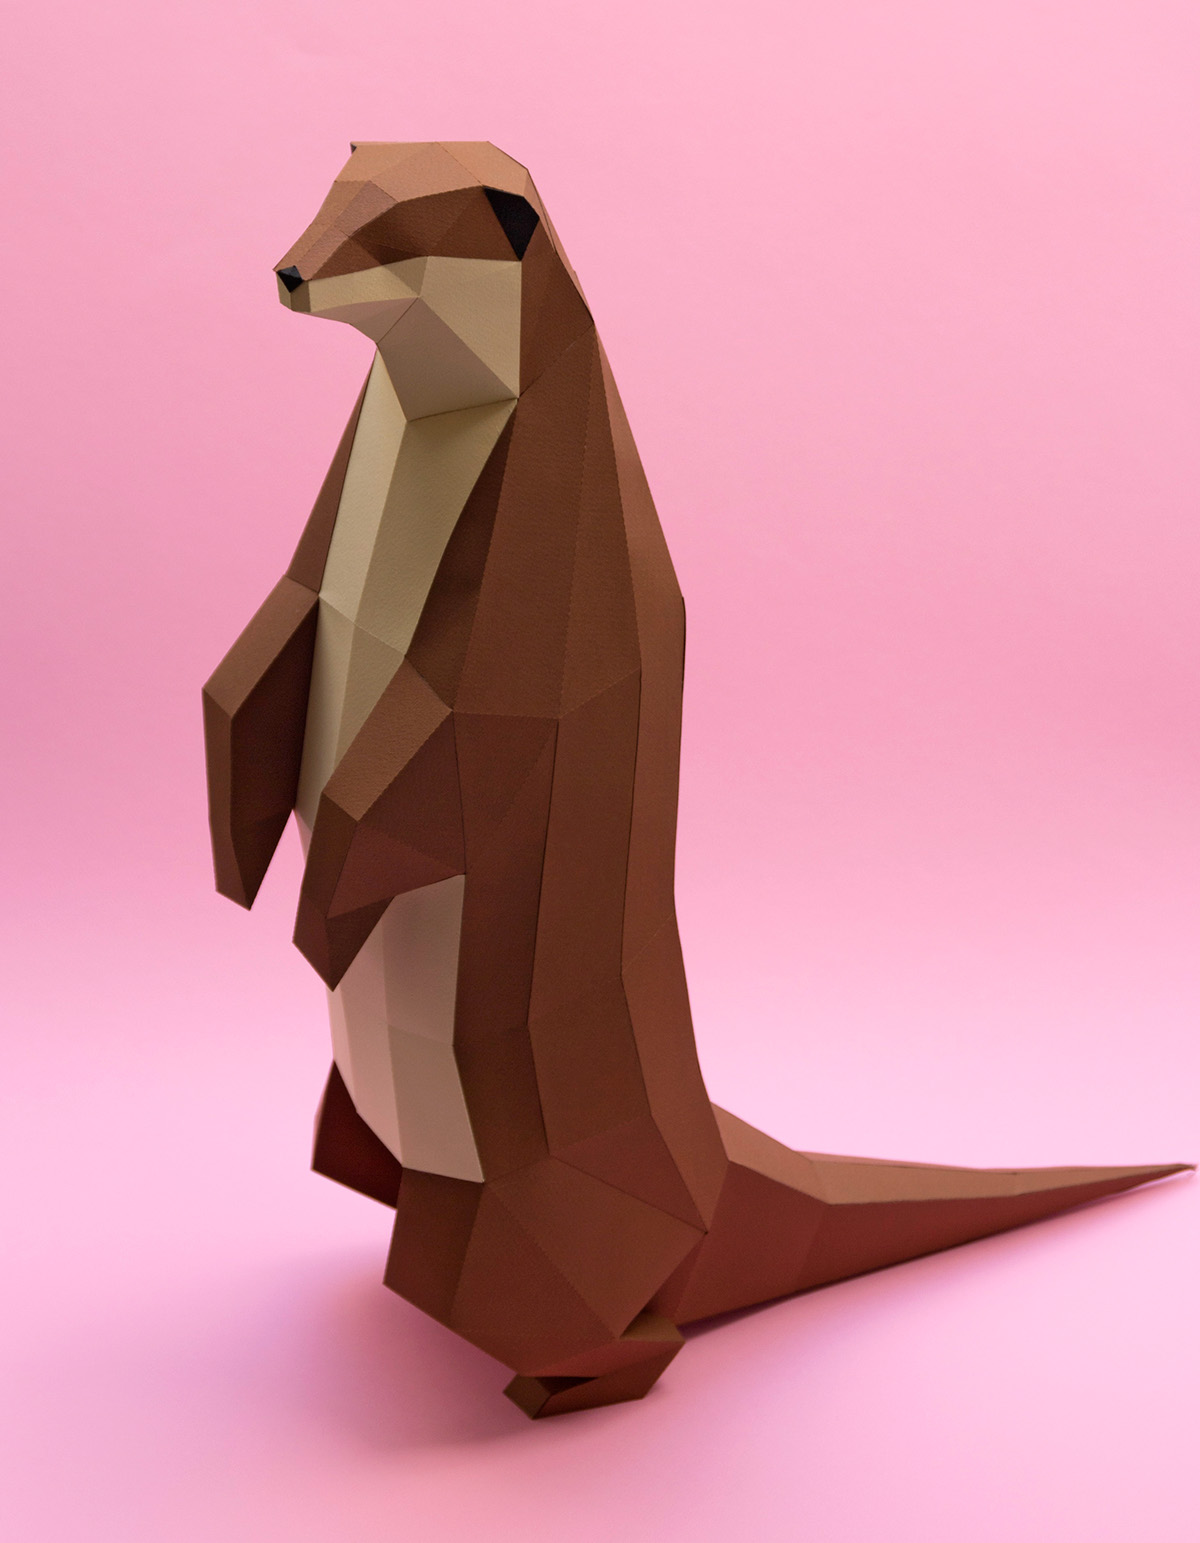 nutria gaviota papercraft gull otter cíes